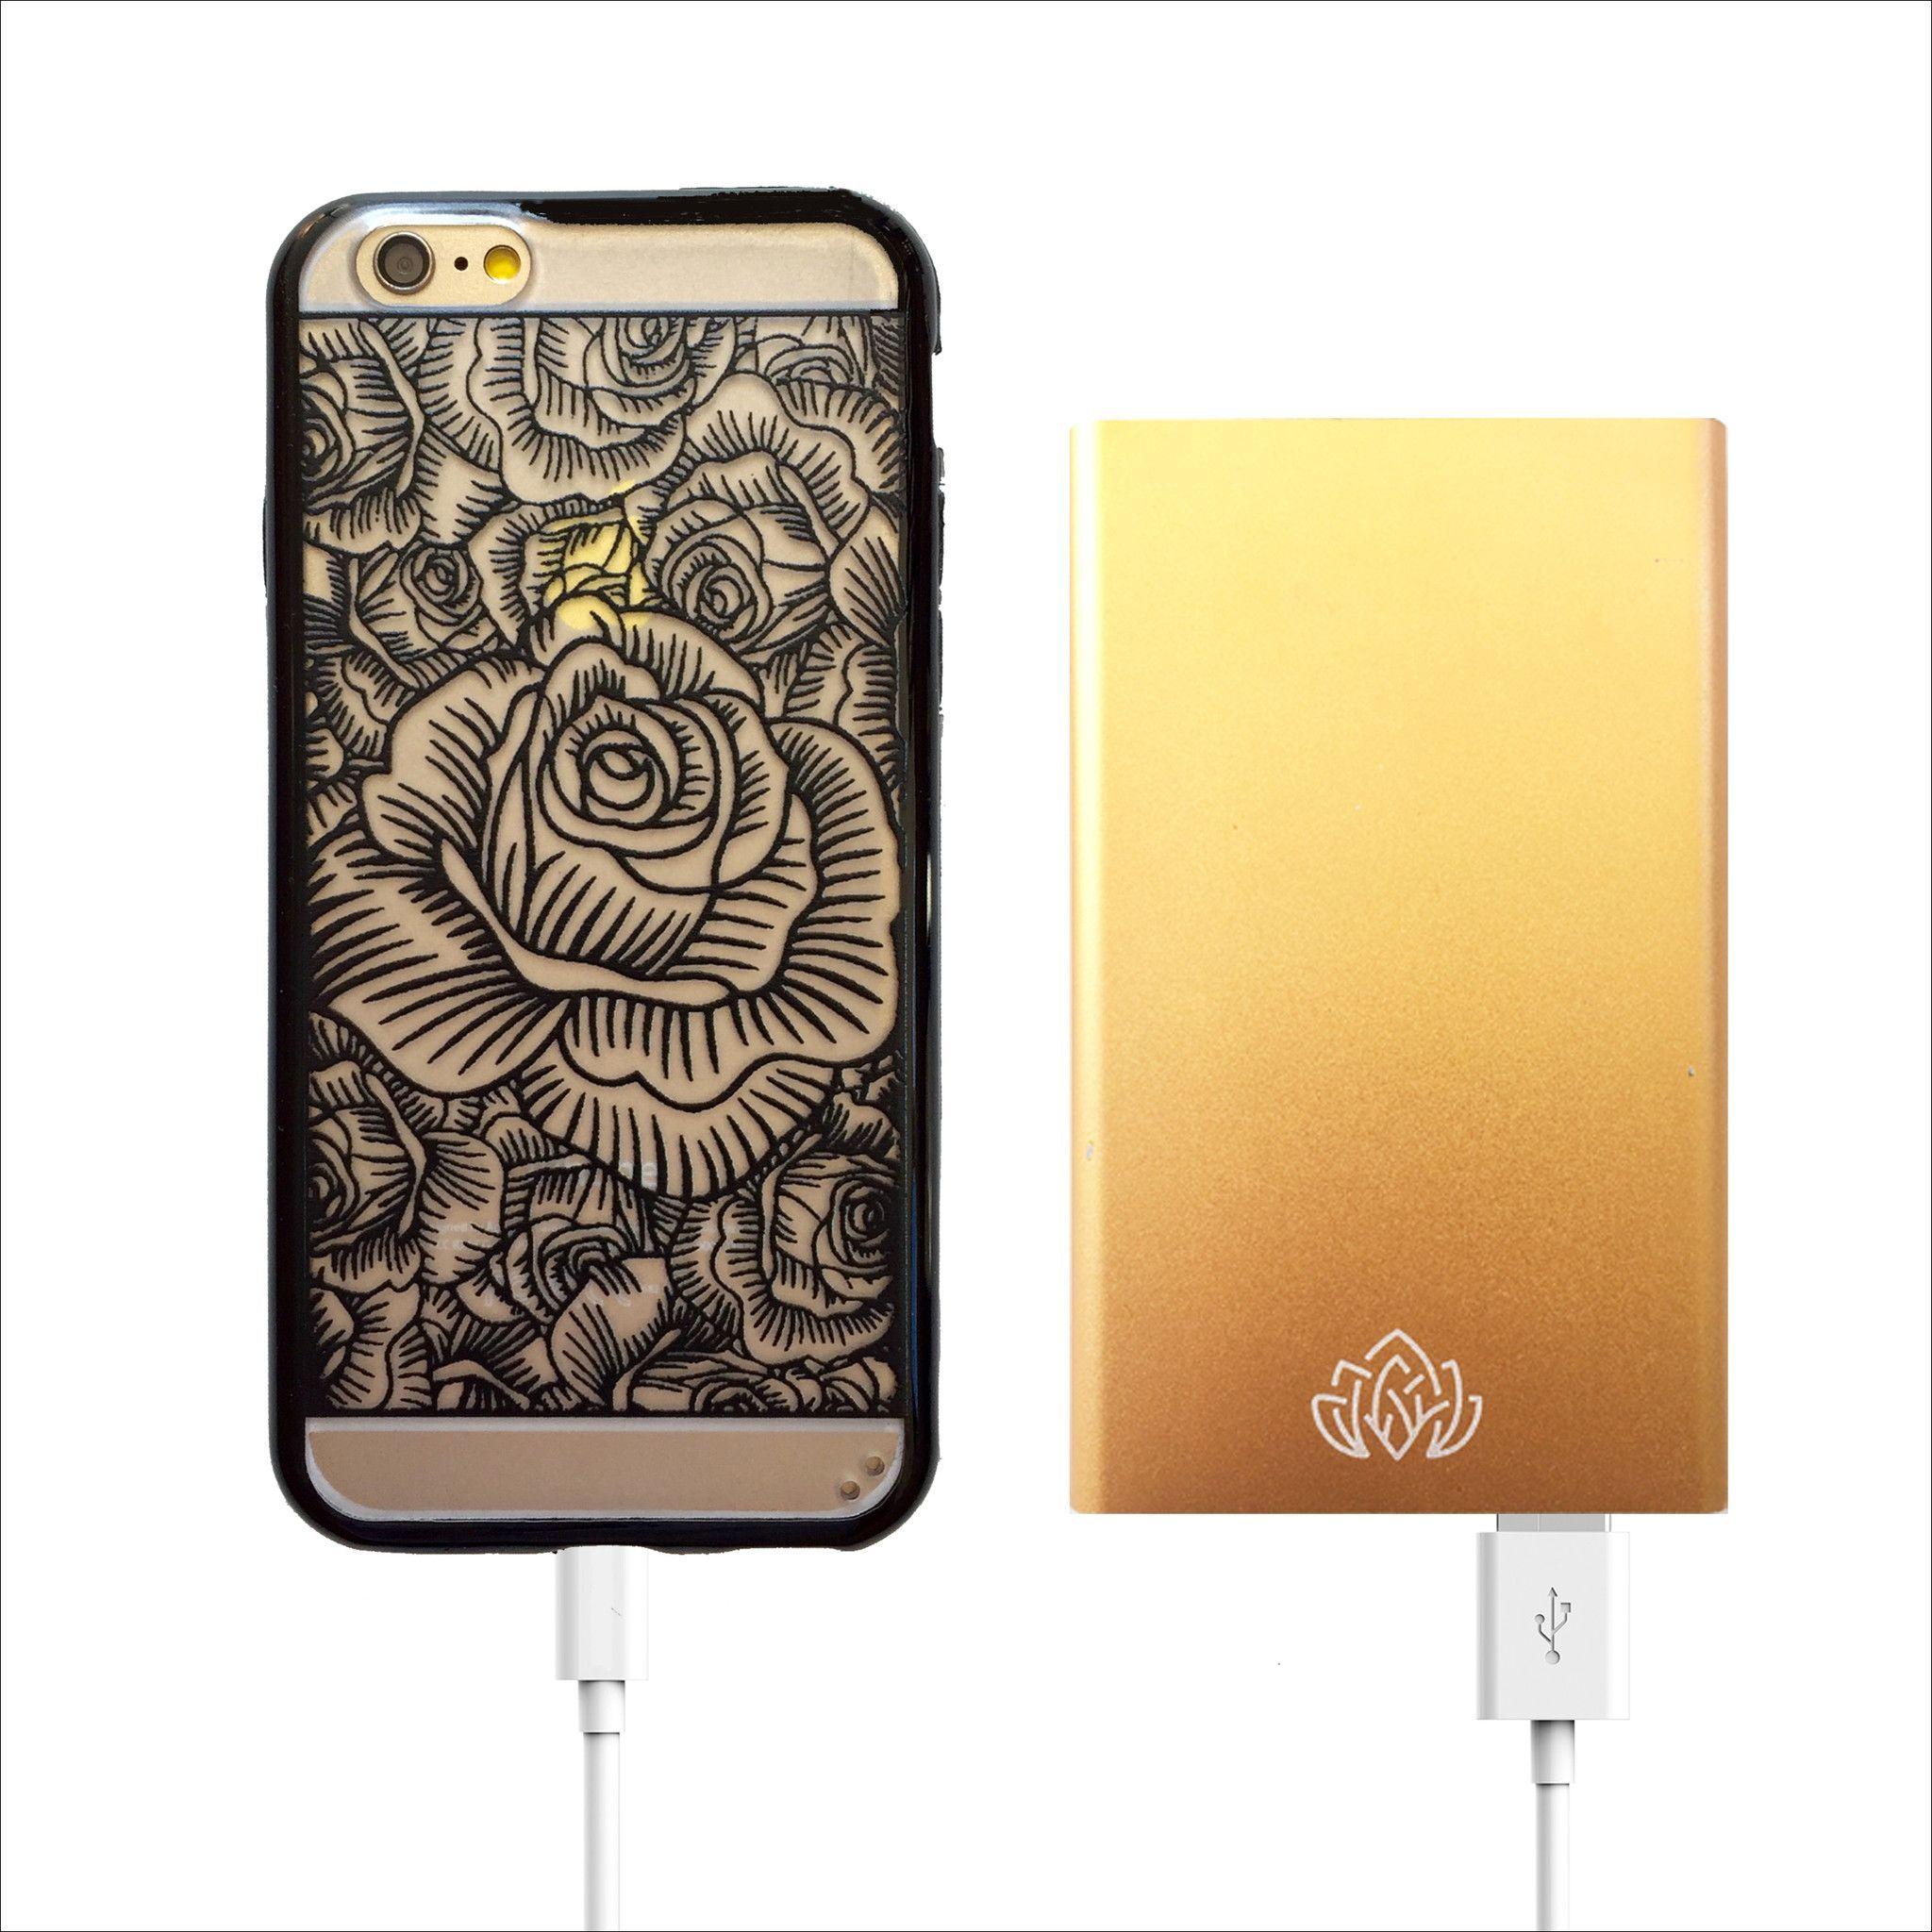 Gold Portable Power Bank Charger - 6000 mAh